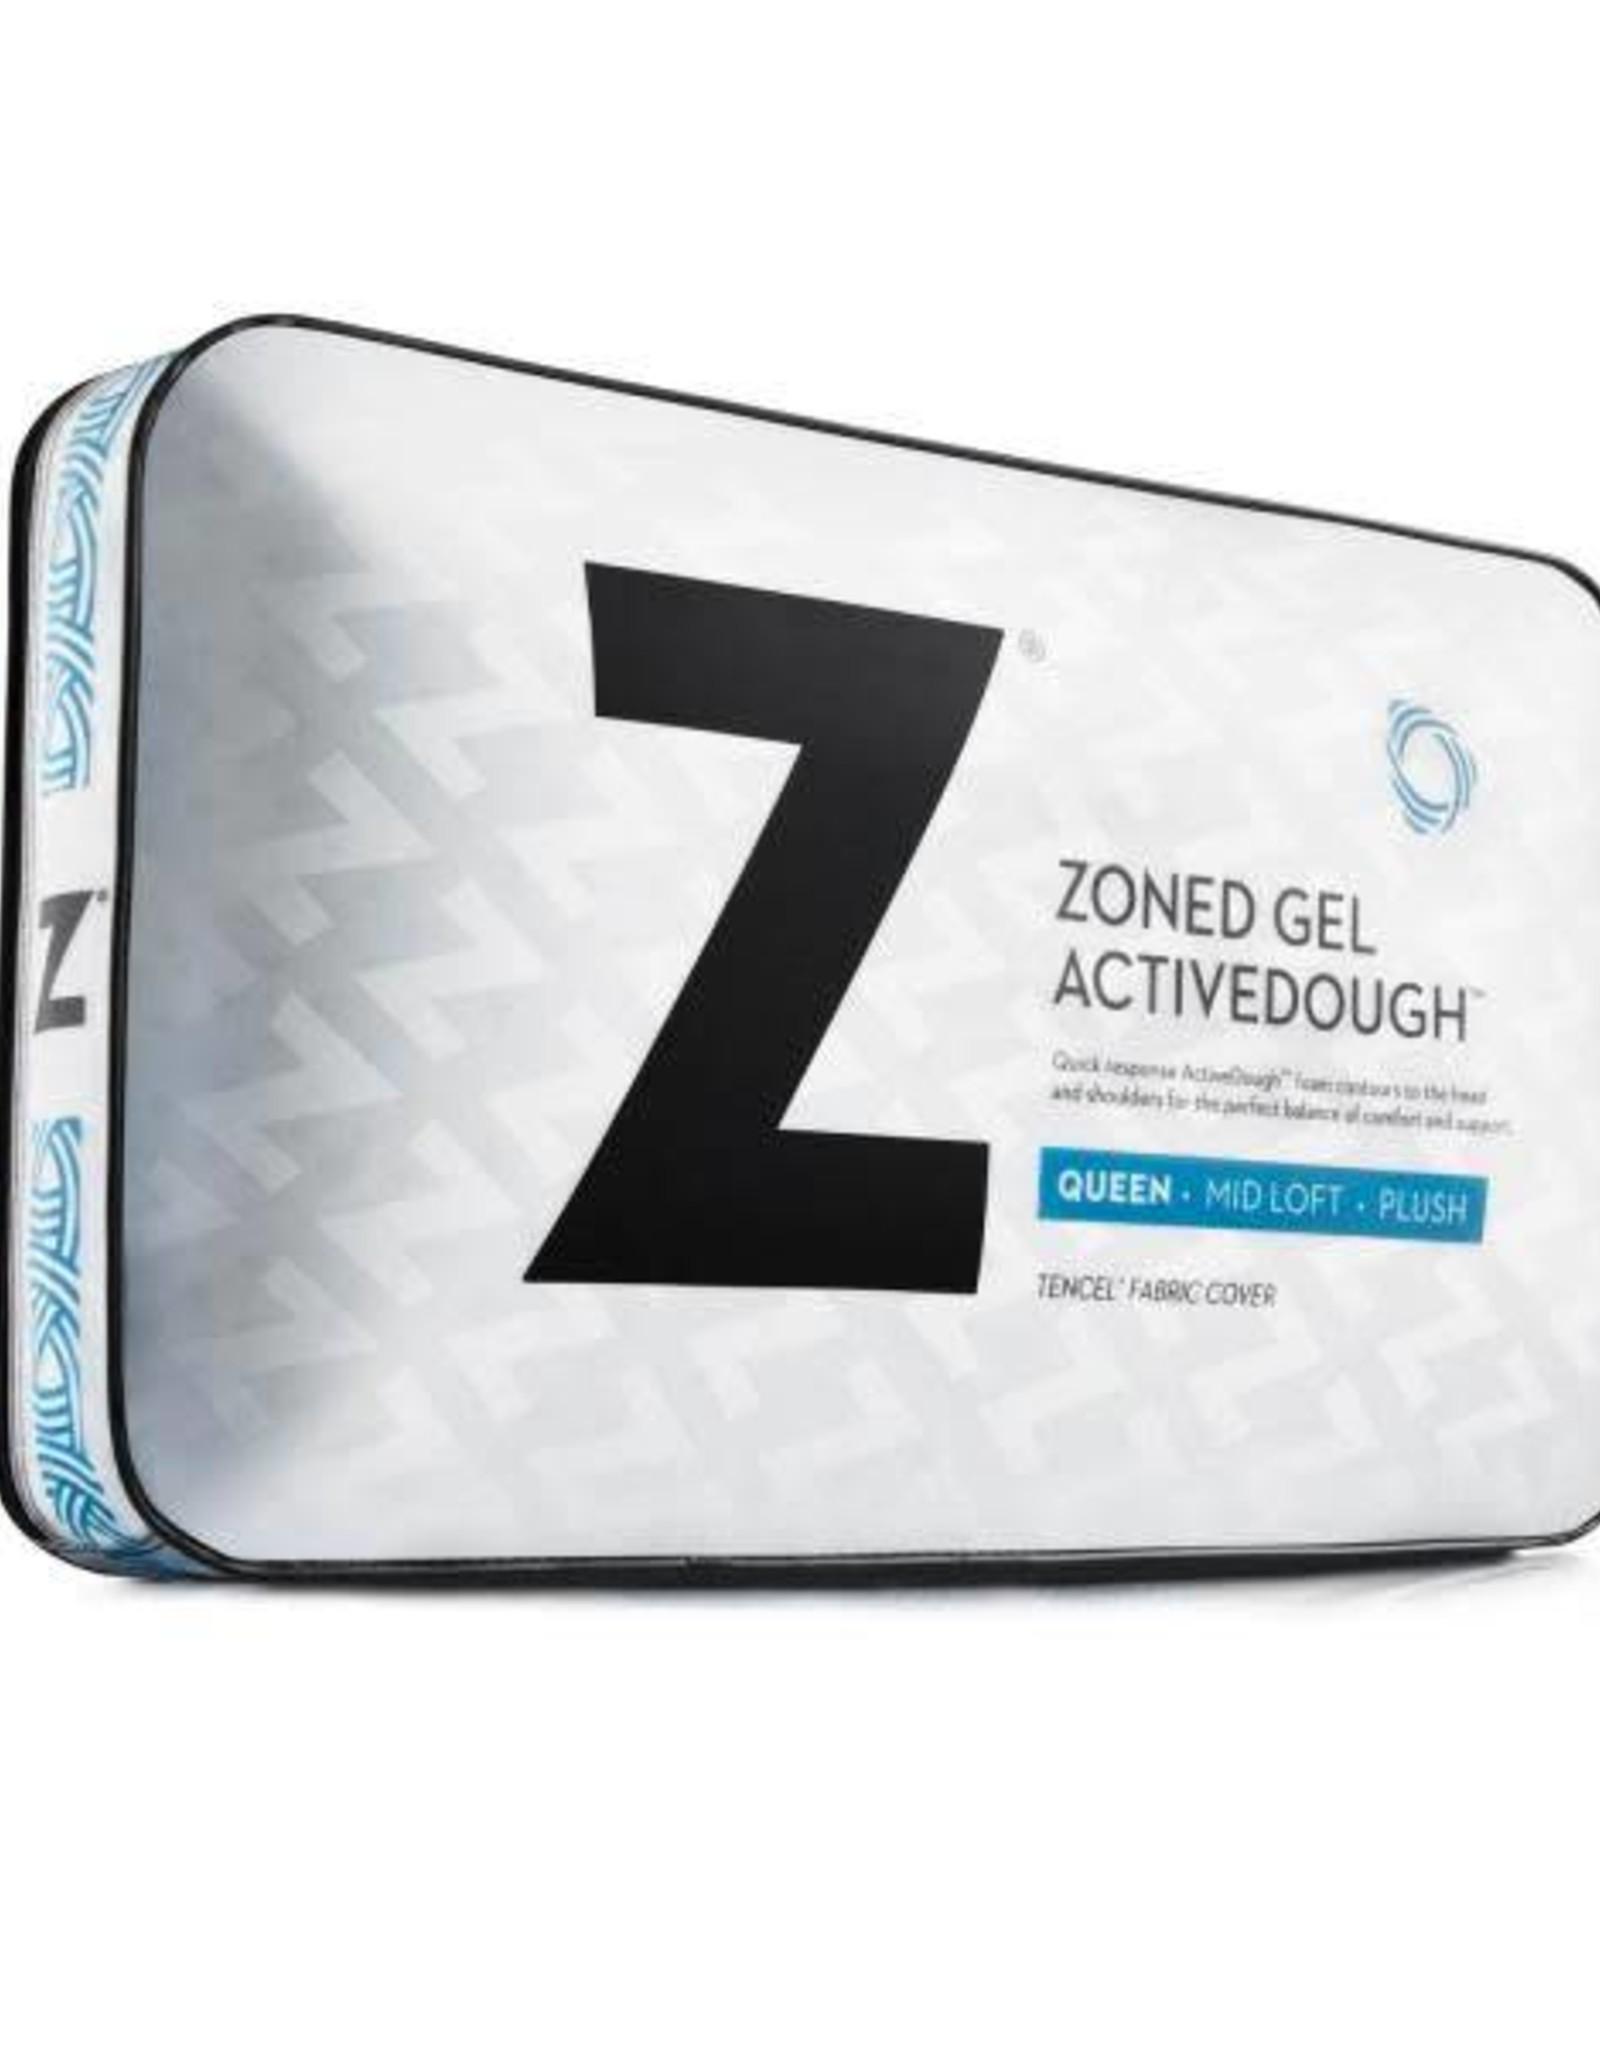 Malouf Z Zoned ActiveDough Gel Pillow - Mid Loft